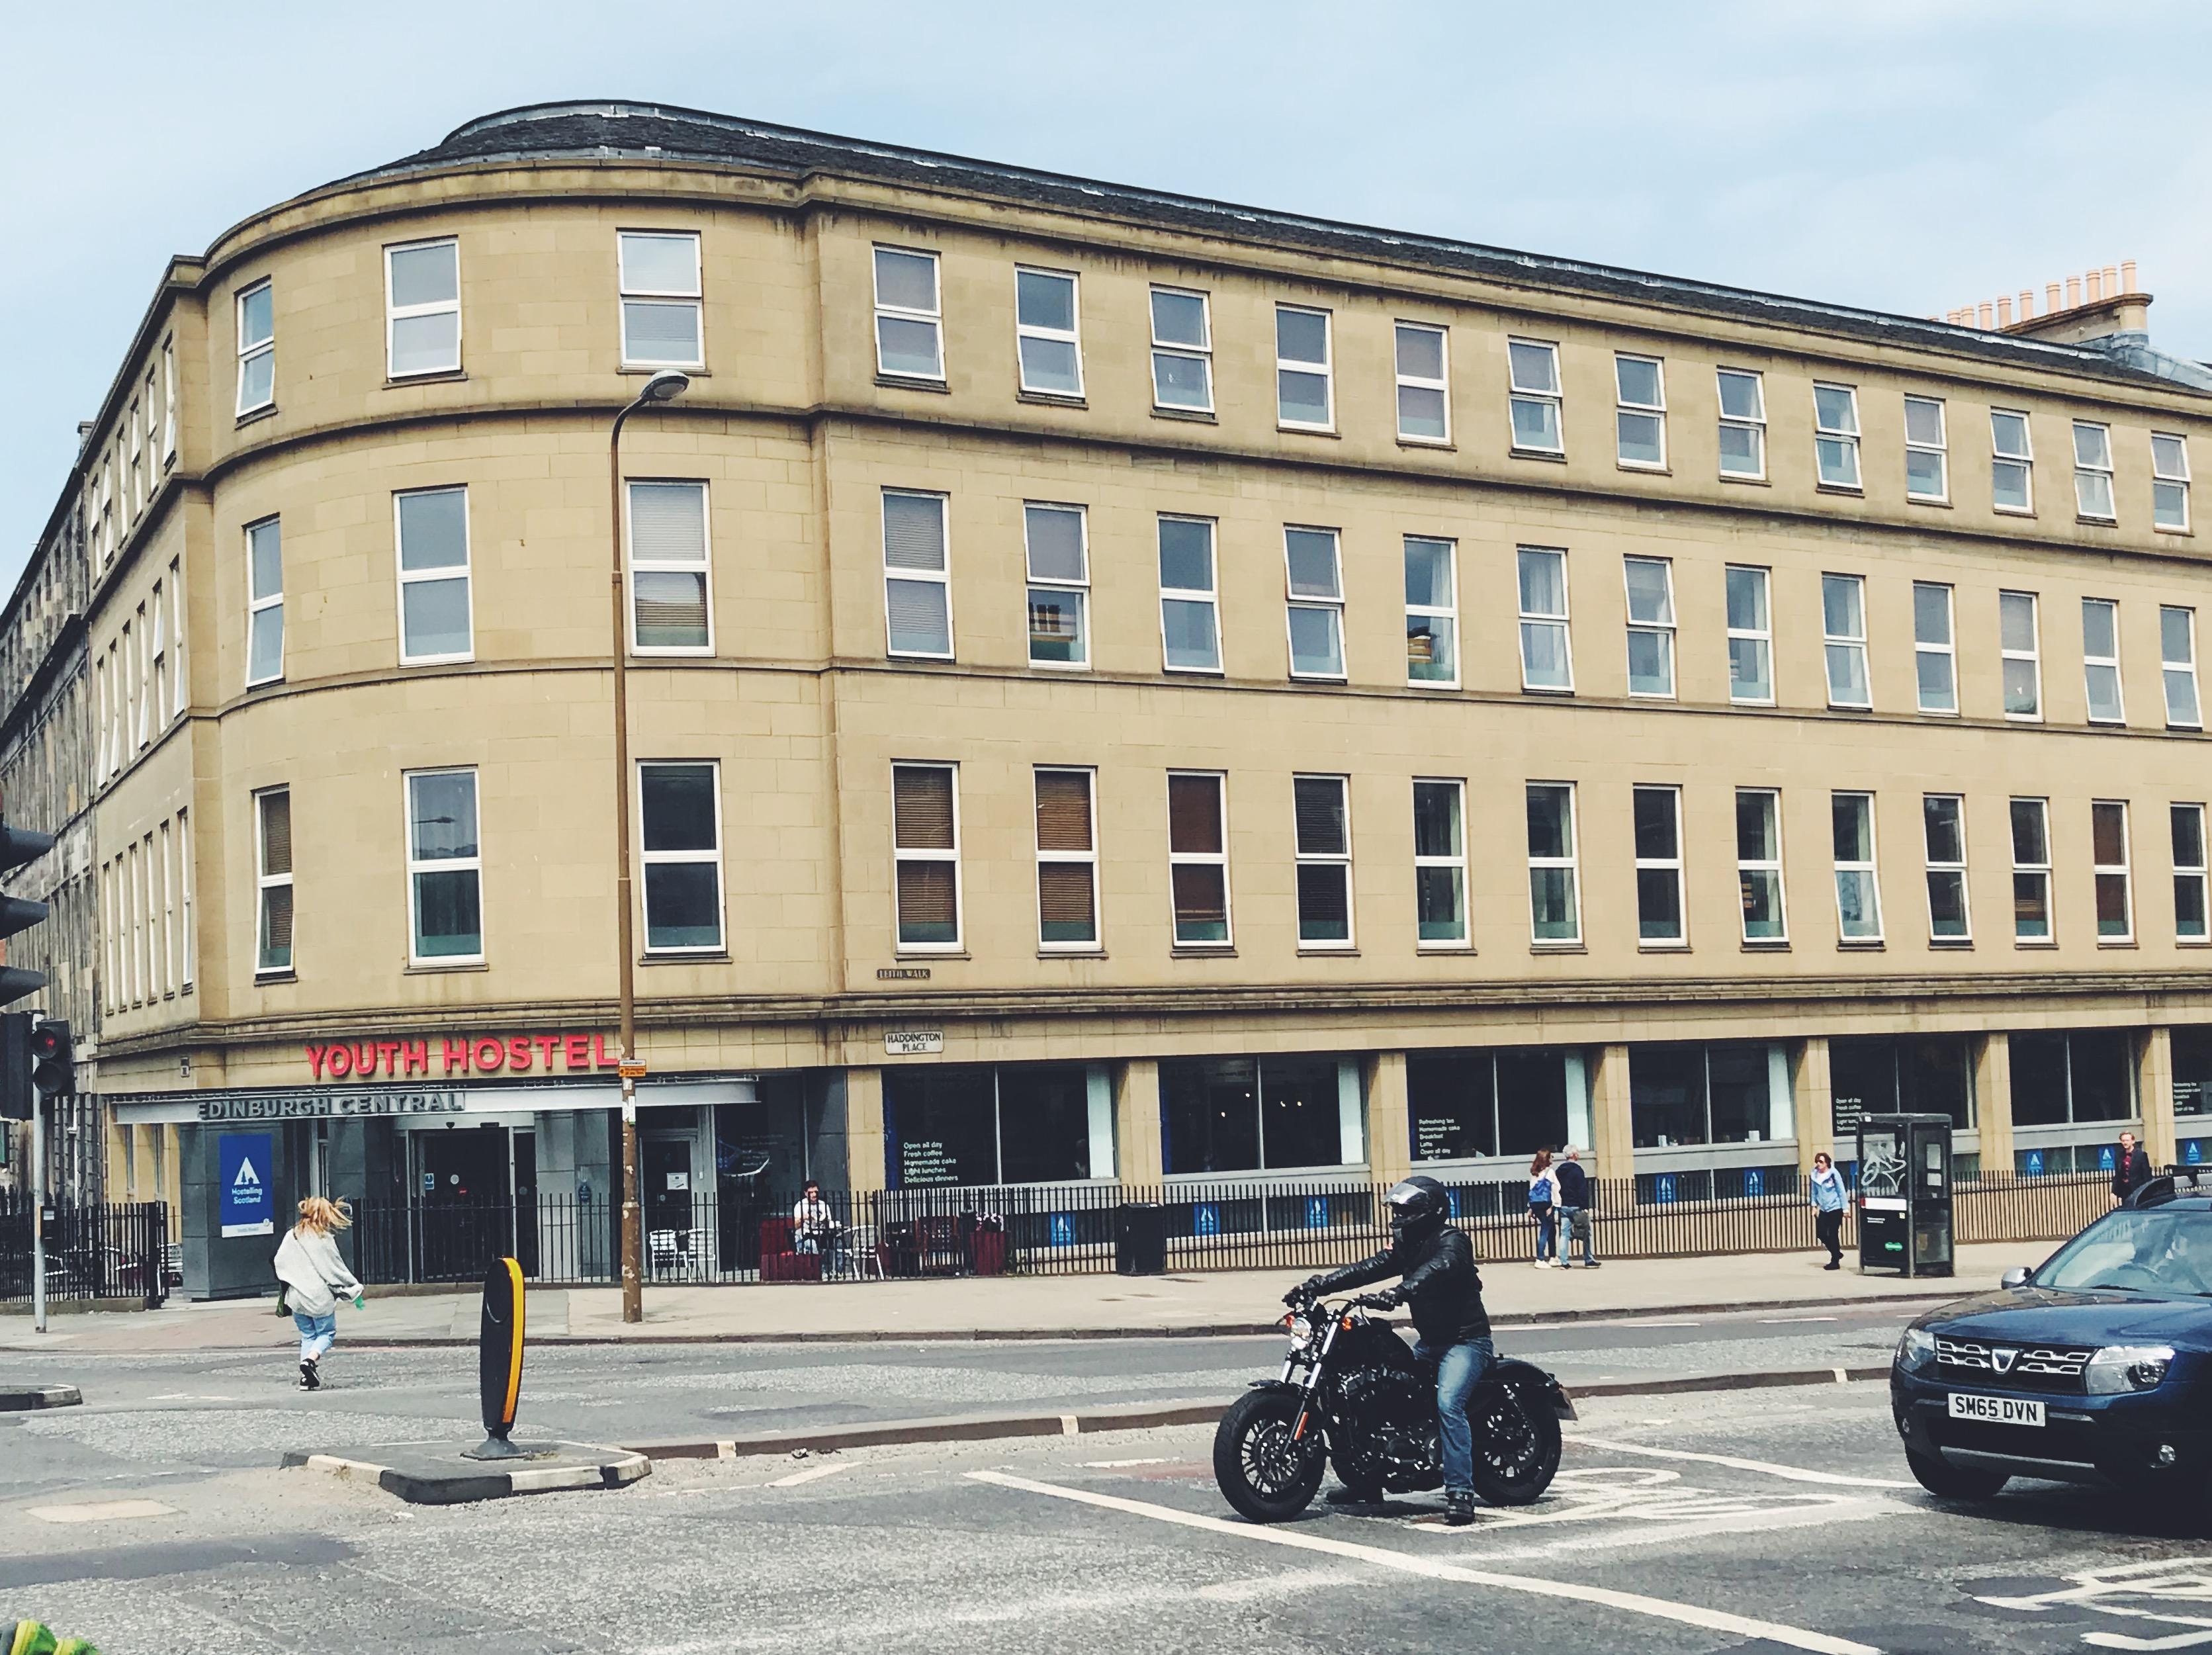 Map Of Youth Hostels In Ireland.Edinburgh Central Youth Hostel Hostelling Scotland